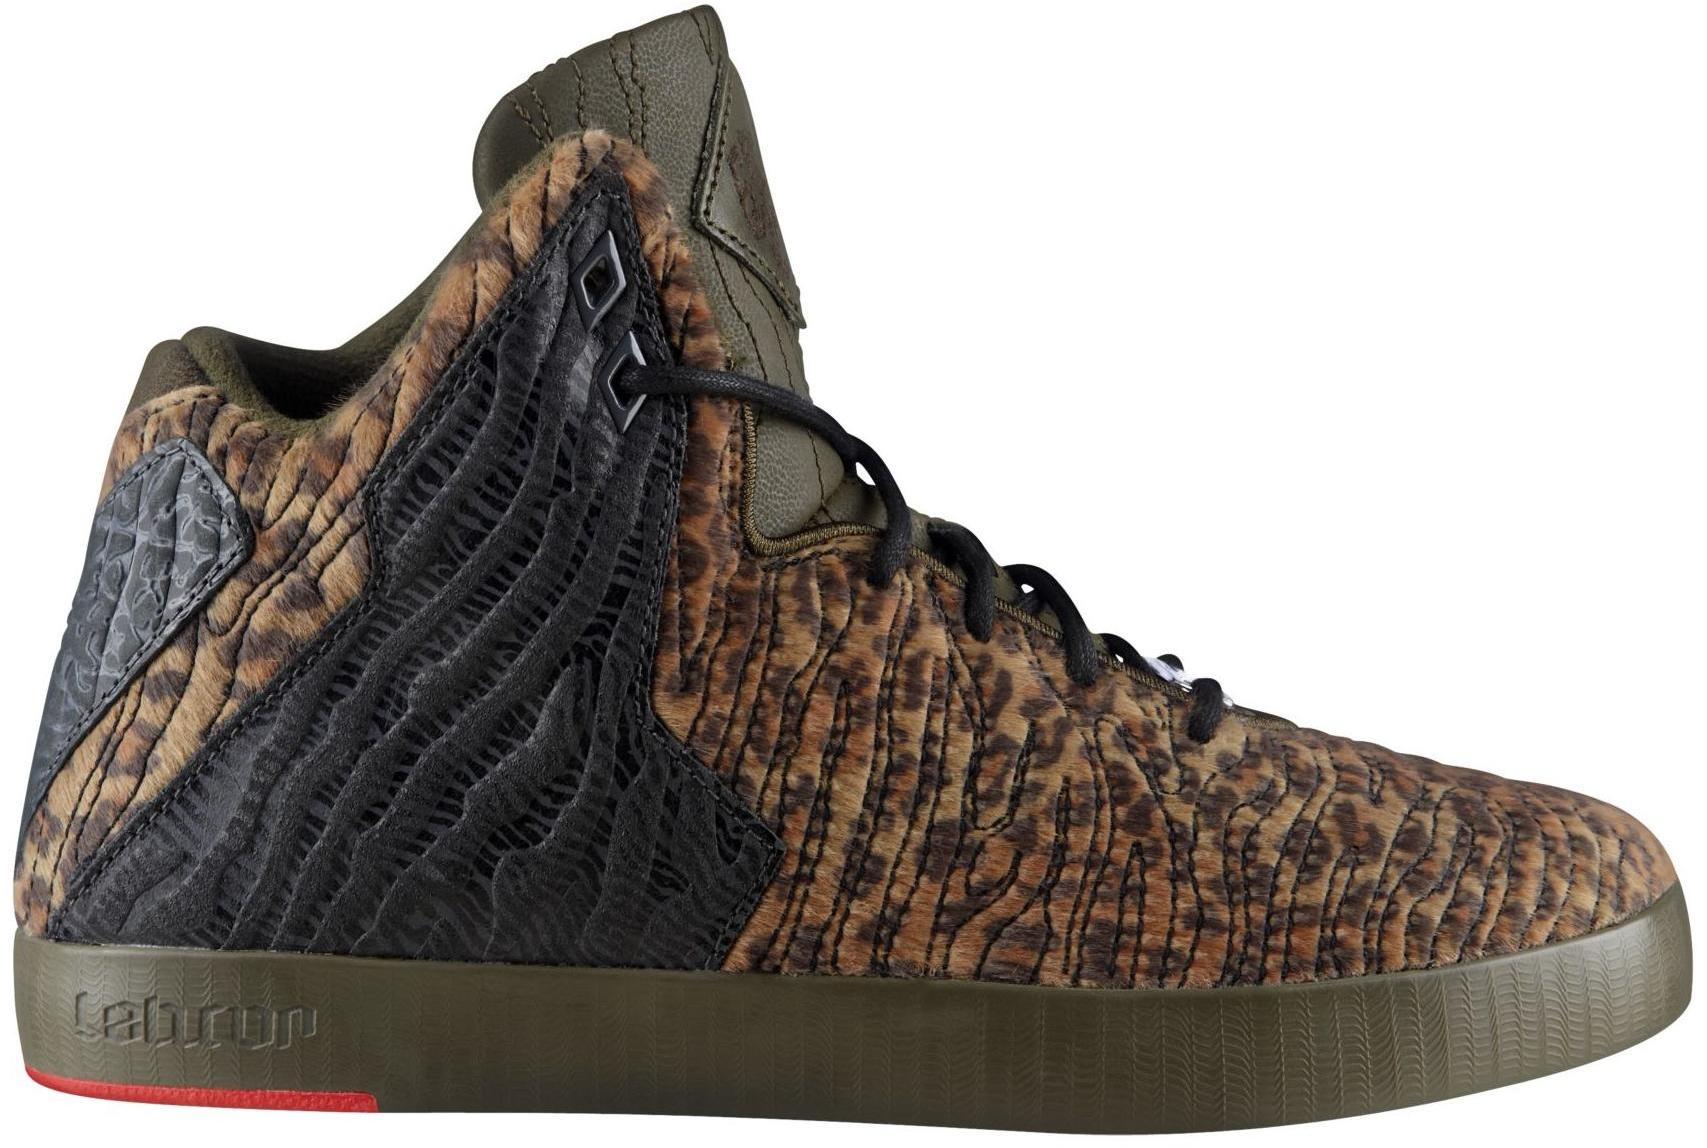 Nike LeBron 11 NSW Leopard - 616766-301